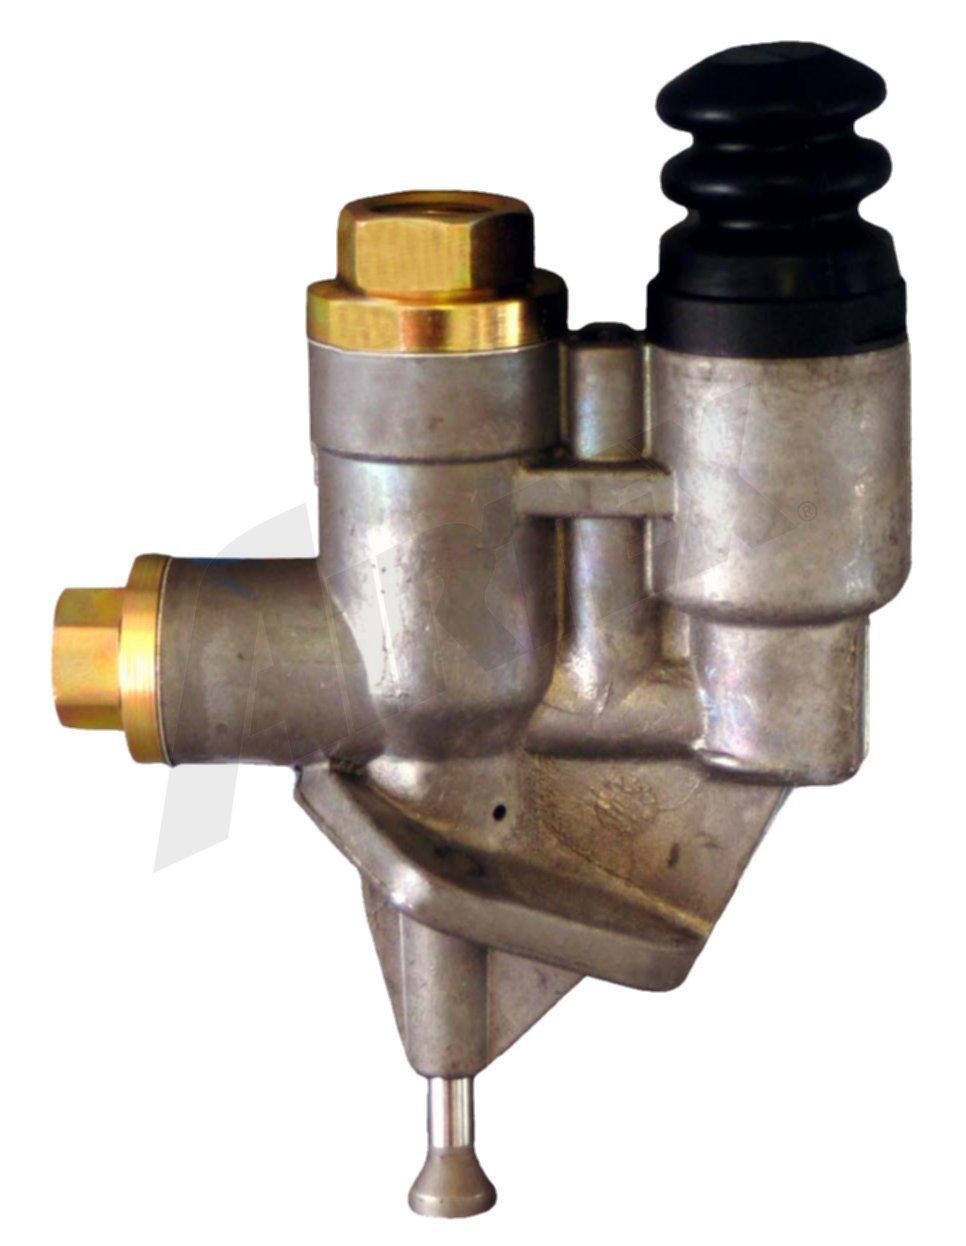 Image of Airtex Fuel Pumps 73104 Mechanical Fuel Pump Fits 1994-1998 Dodge Ram 2500